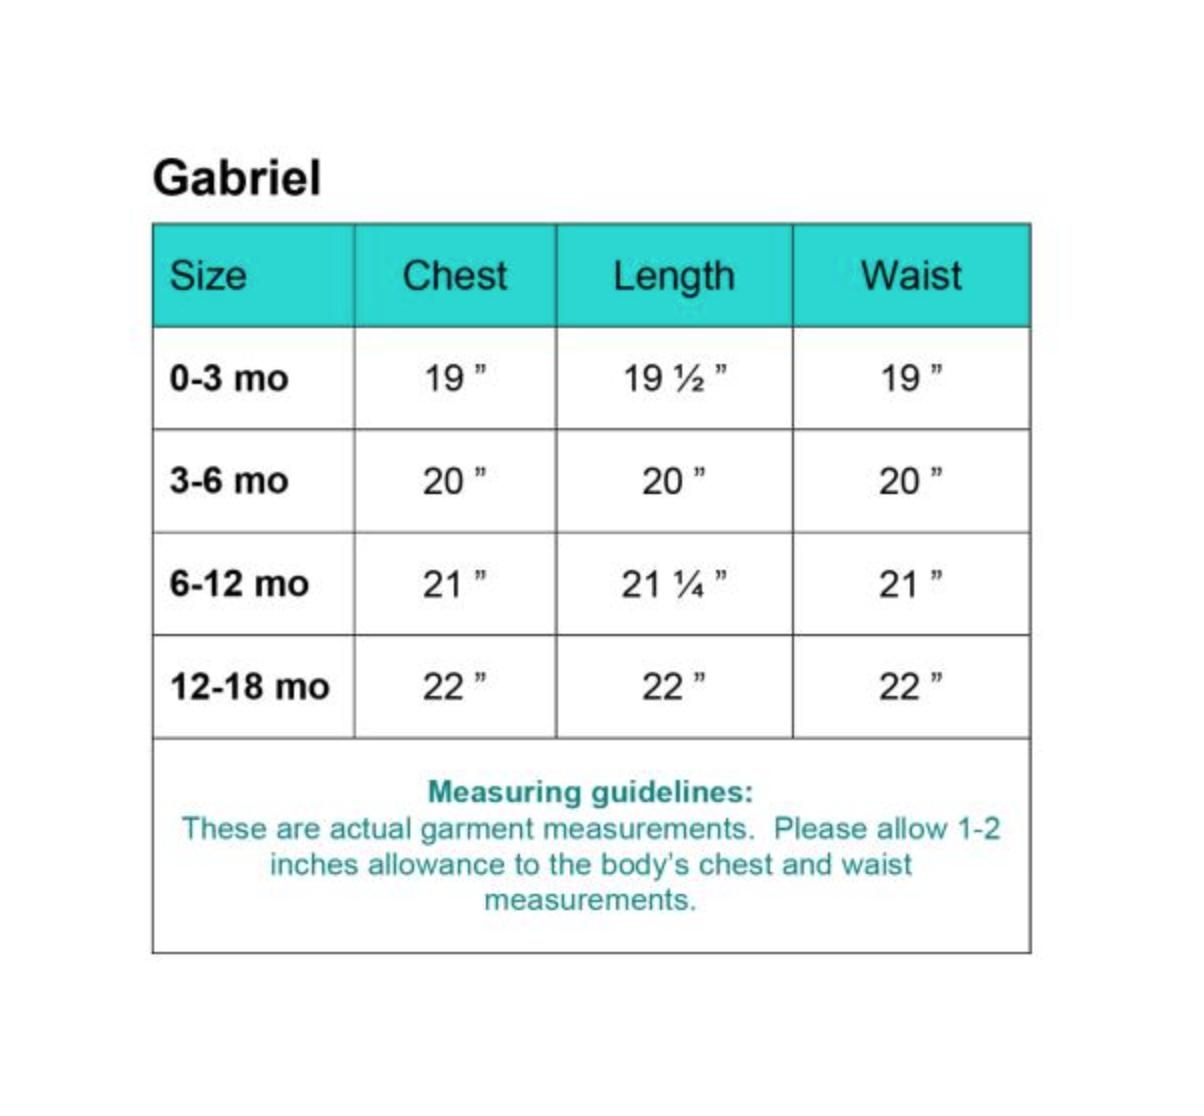 sizing-chart-gabriel.png